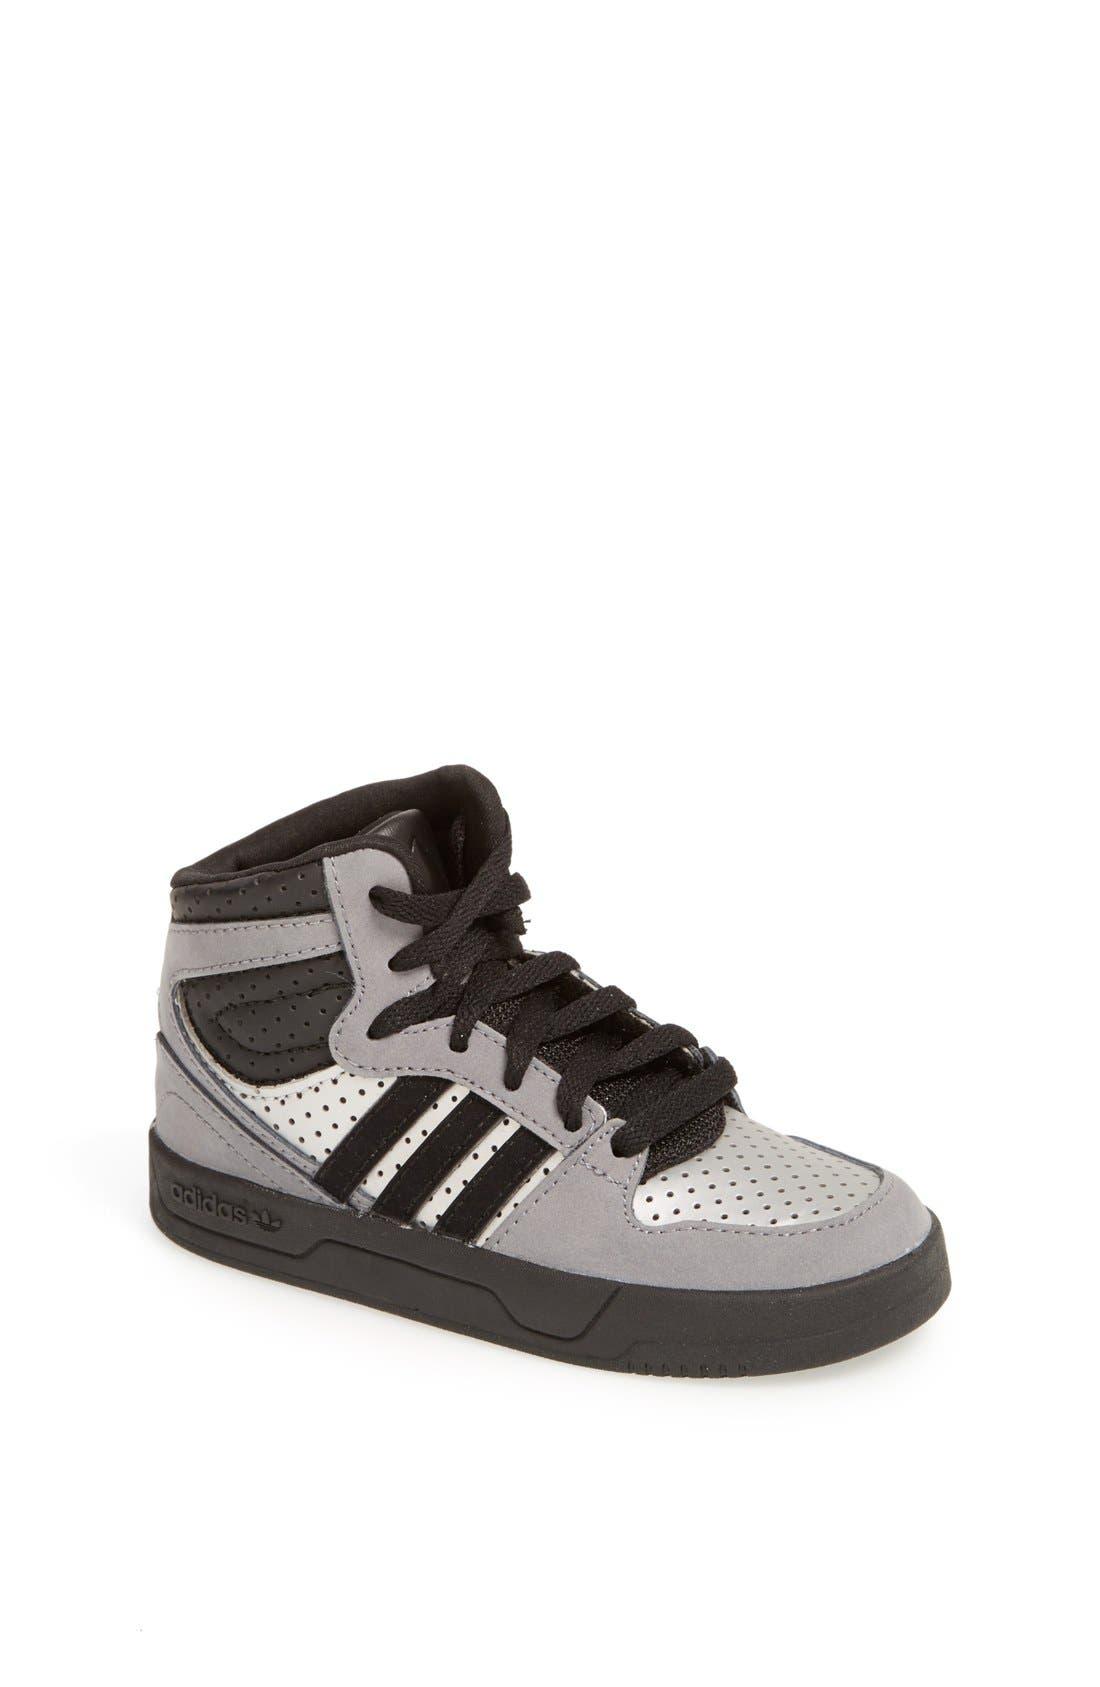 Alternate Image 1 Selected - adidas 'Court Attitude' Sneaker (Baby, Walker & Toddler)